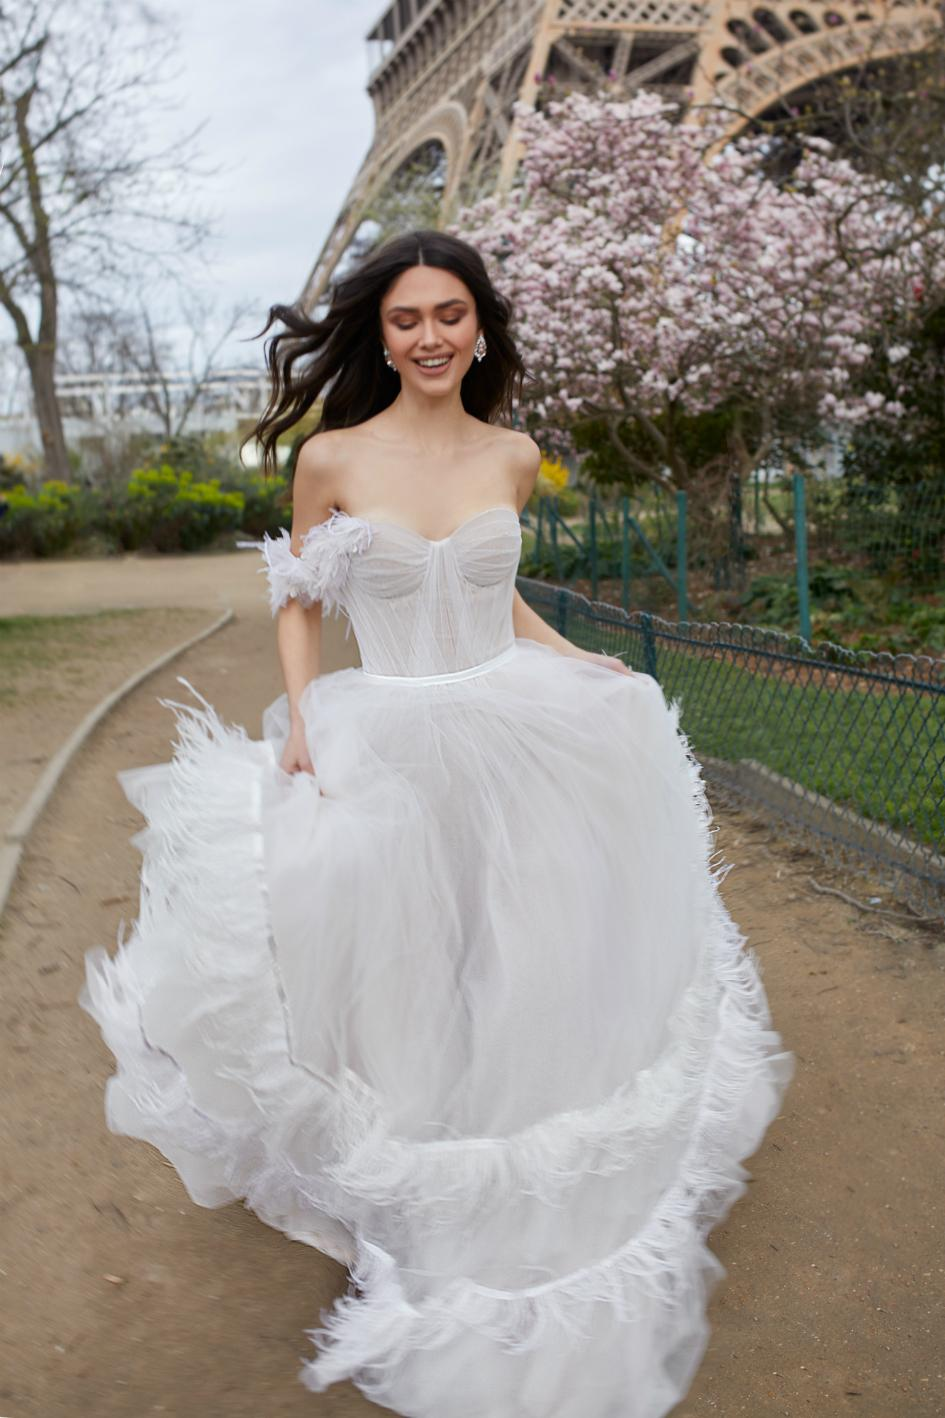 dress feather julie vino shoulder bridal paris bride dresses romantic samantha trunk tulle sweetheart partybravo collection sleeves neckline backless line